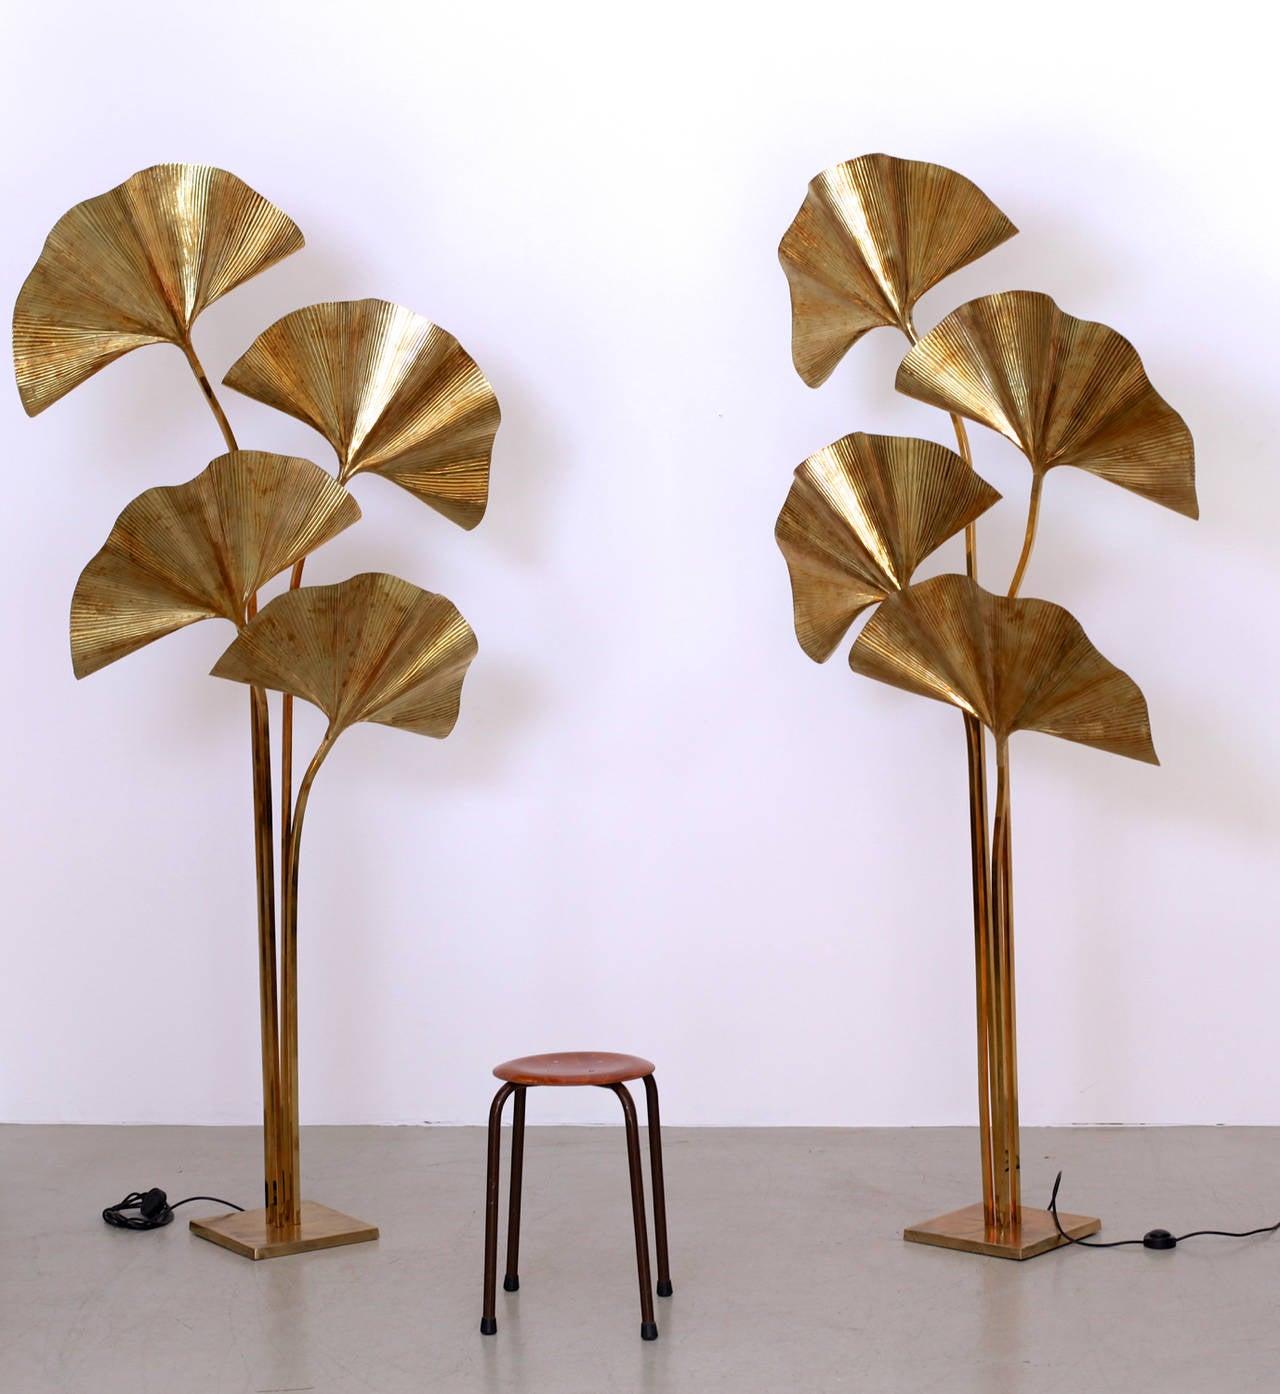 Huge Four Ginkgo Leaf Brass Floor Lamp by Tommaso Barbi 3